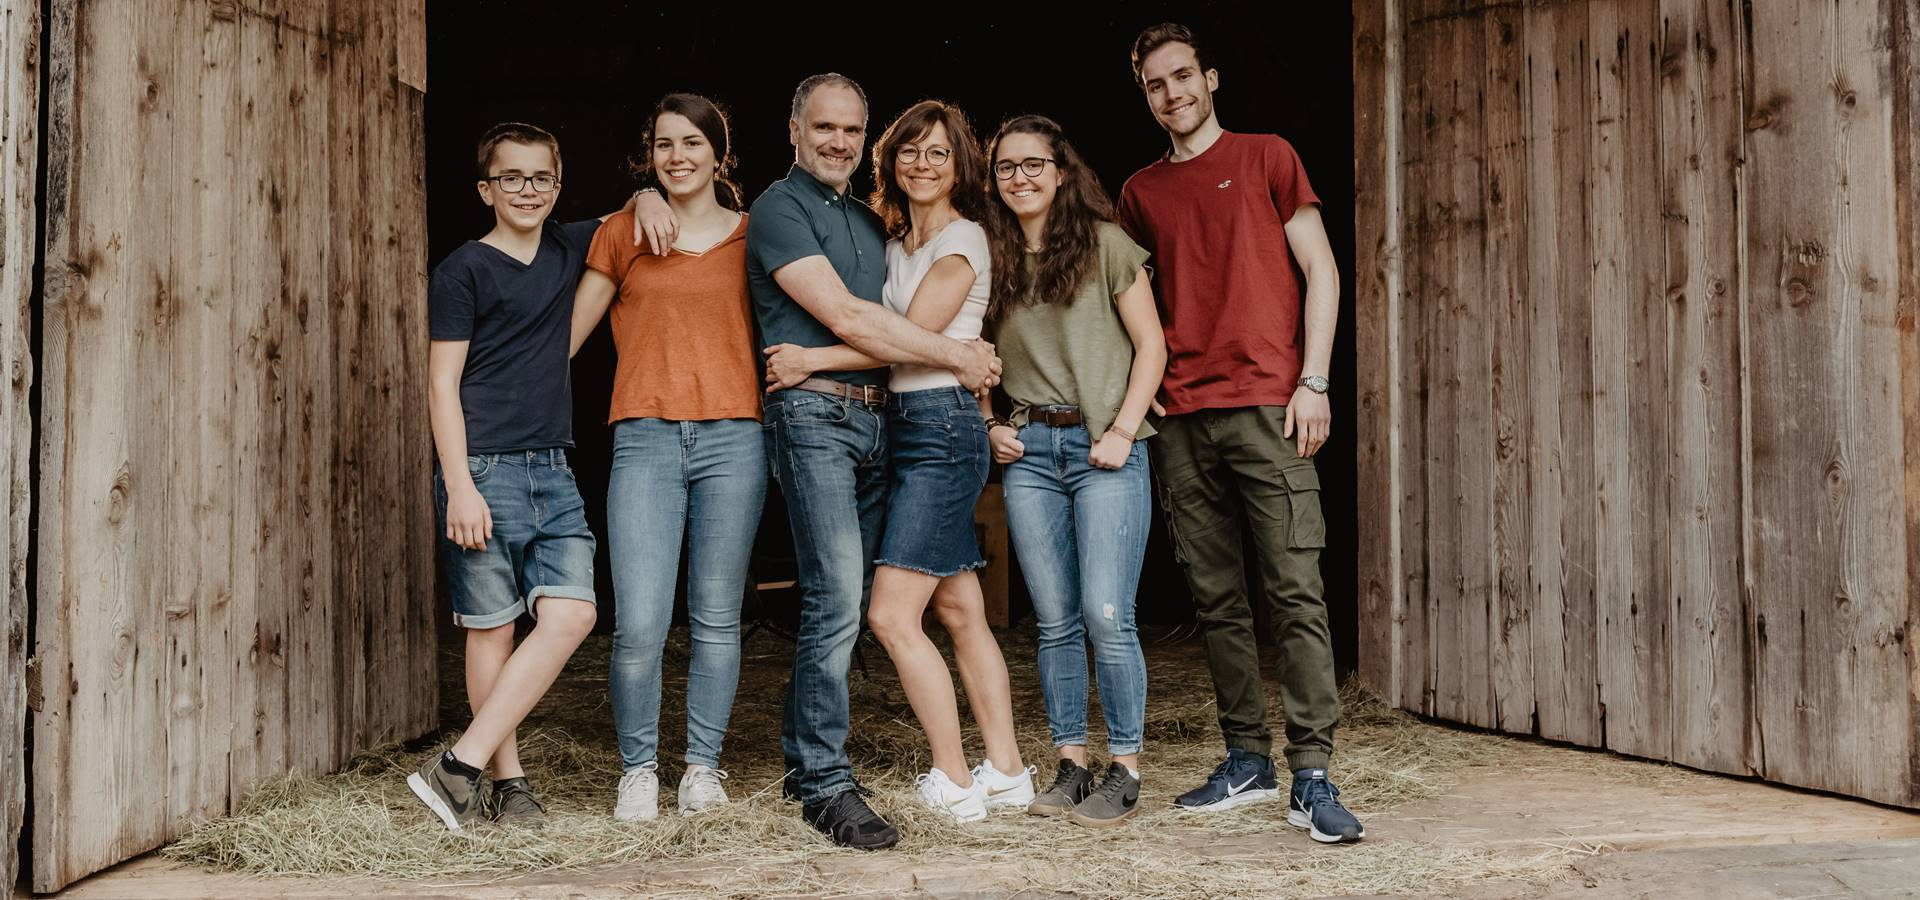 Familie Ketterer Familienbild 2019 - Griesbachhof Schwarzwald